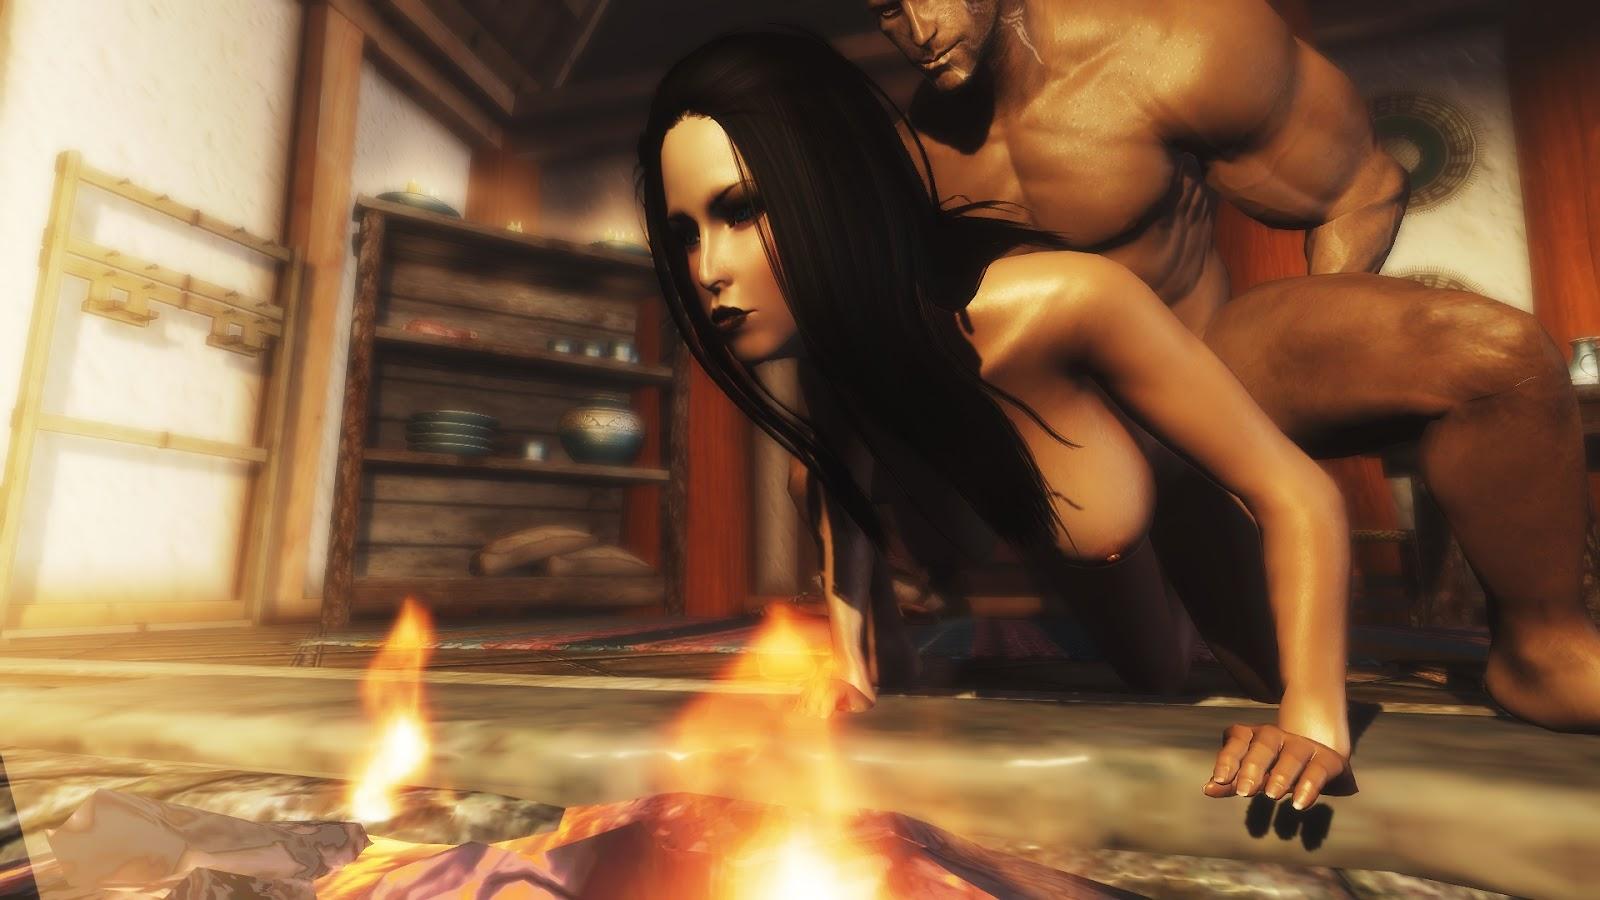 Sarah lombardi nude